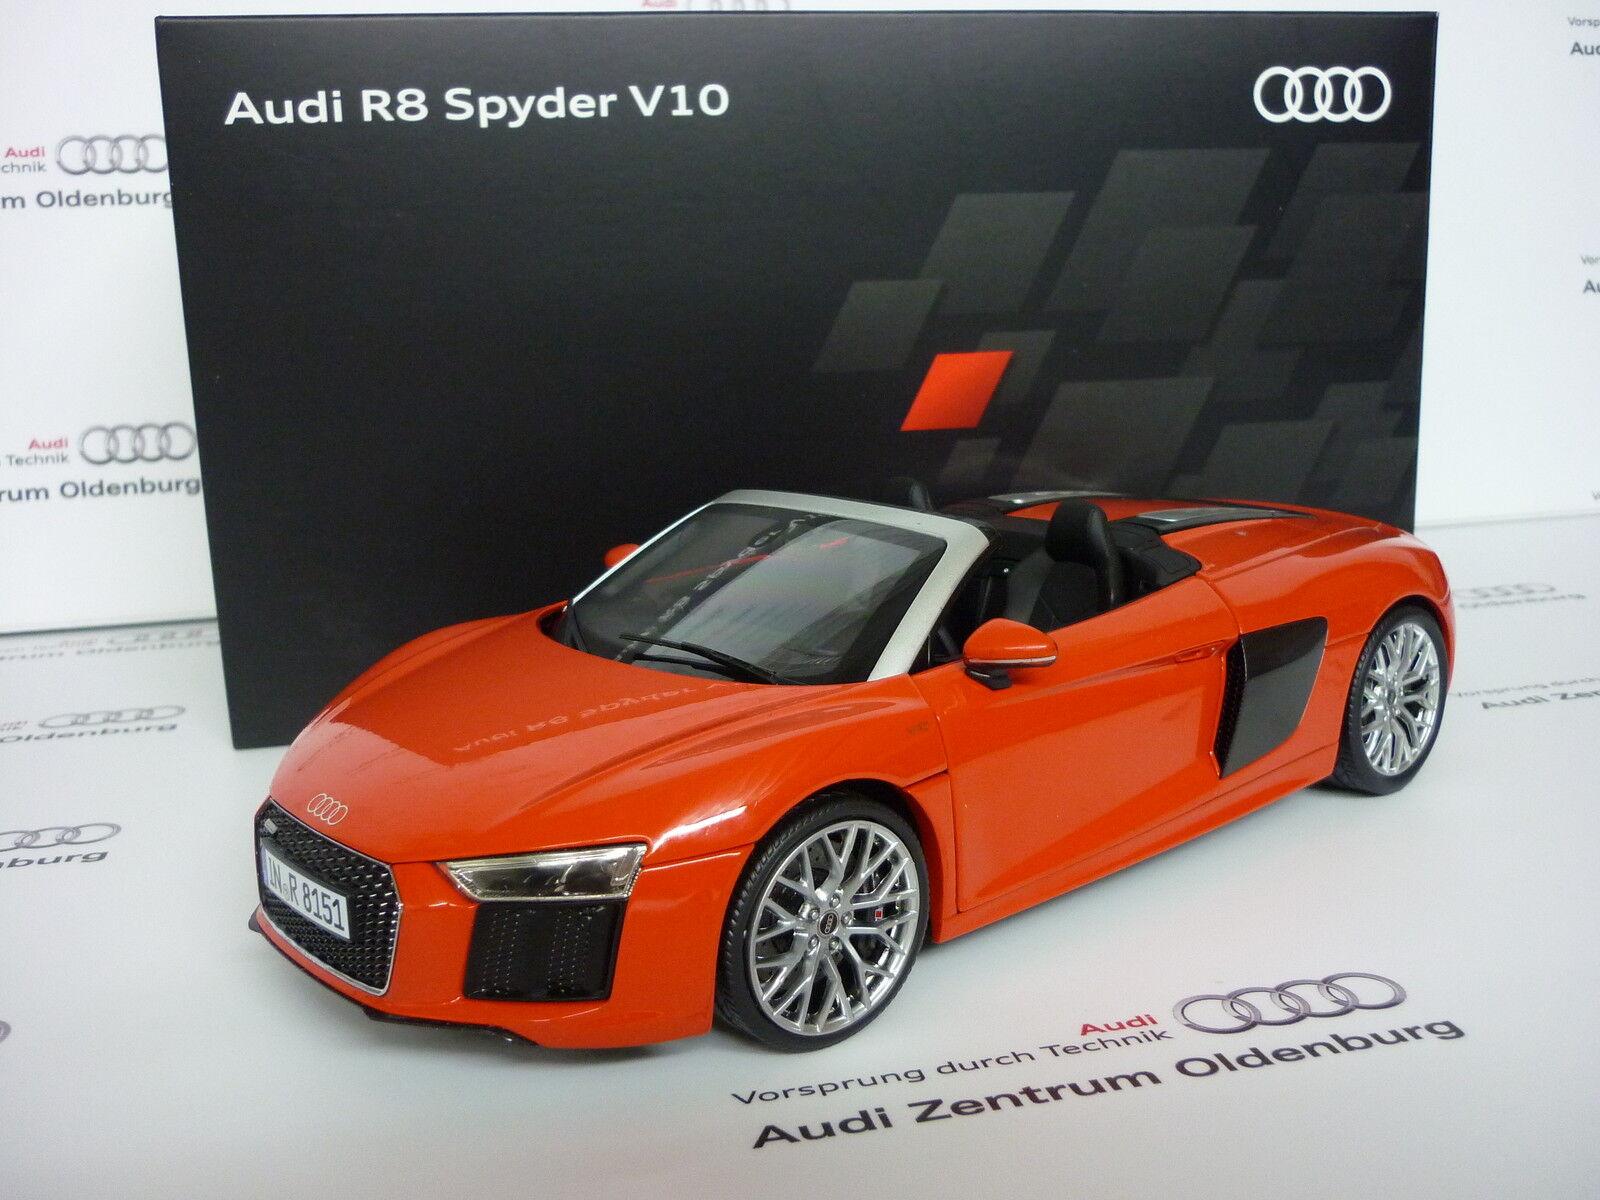 ORIGINALE AUDI Modellino Auto Audi R8 R8 R8 Spyder V10 dynamitrot 1:18, AUDI SPORT 4fbfa5